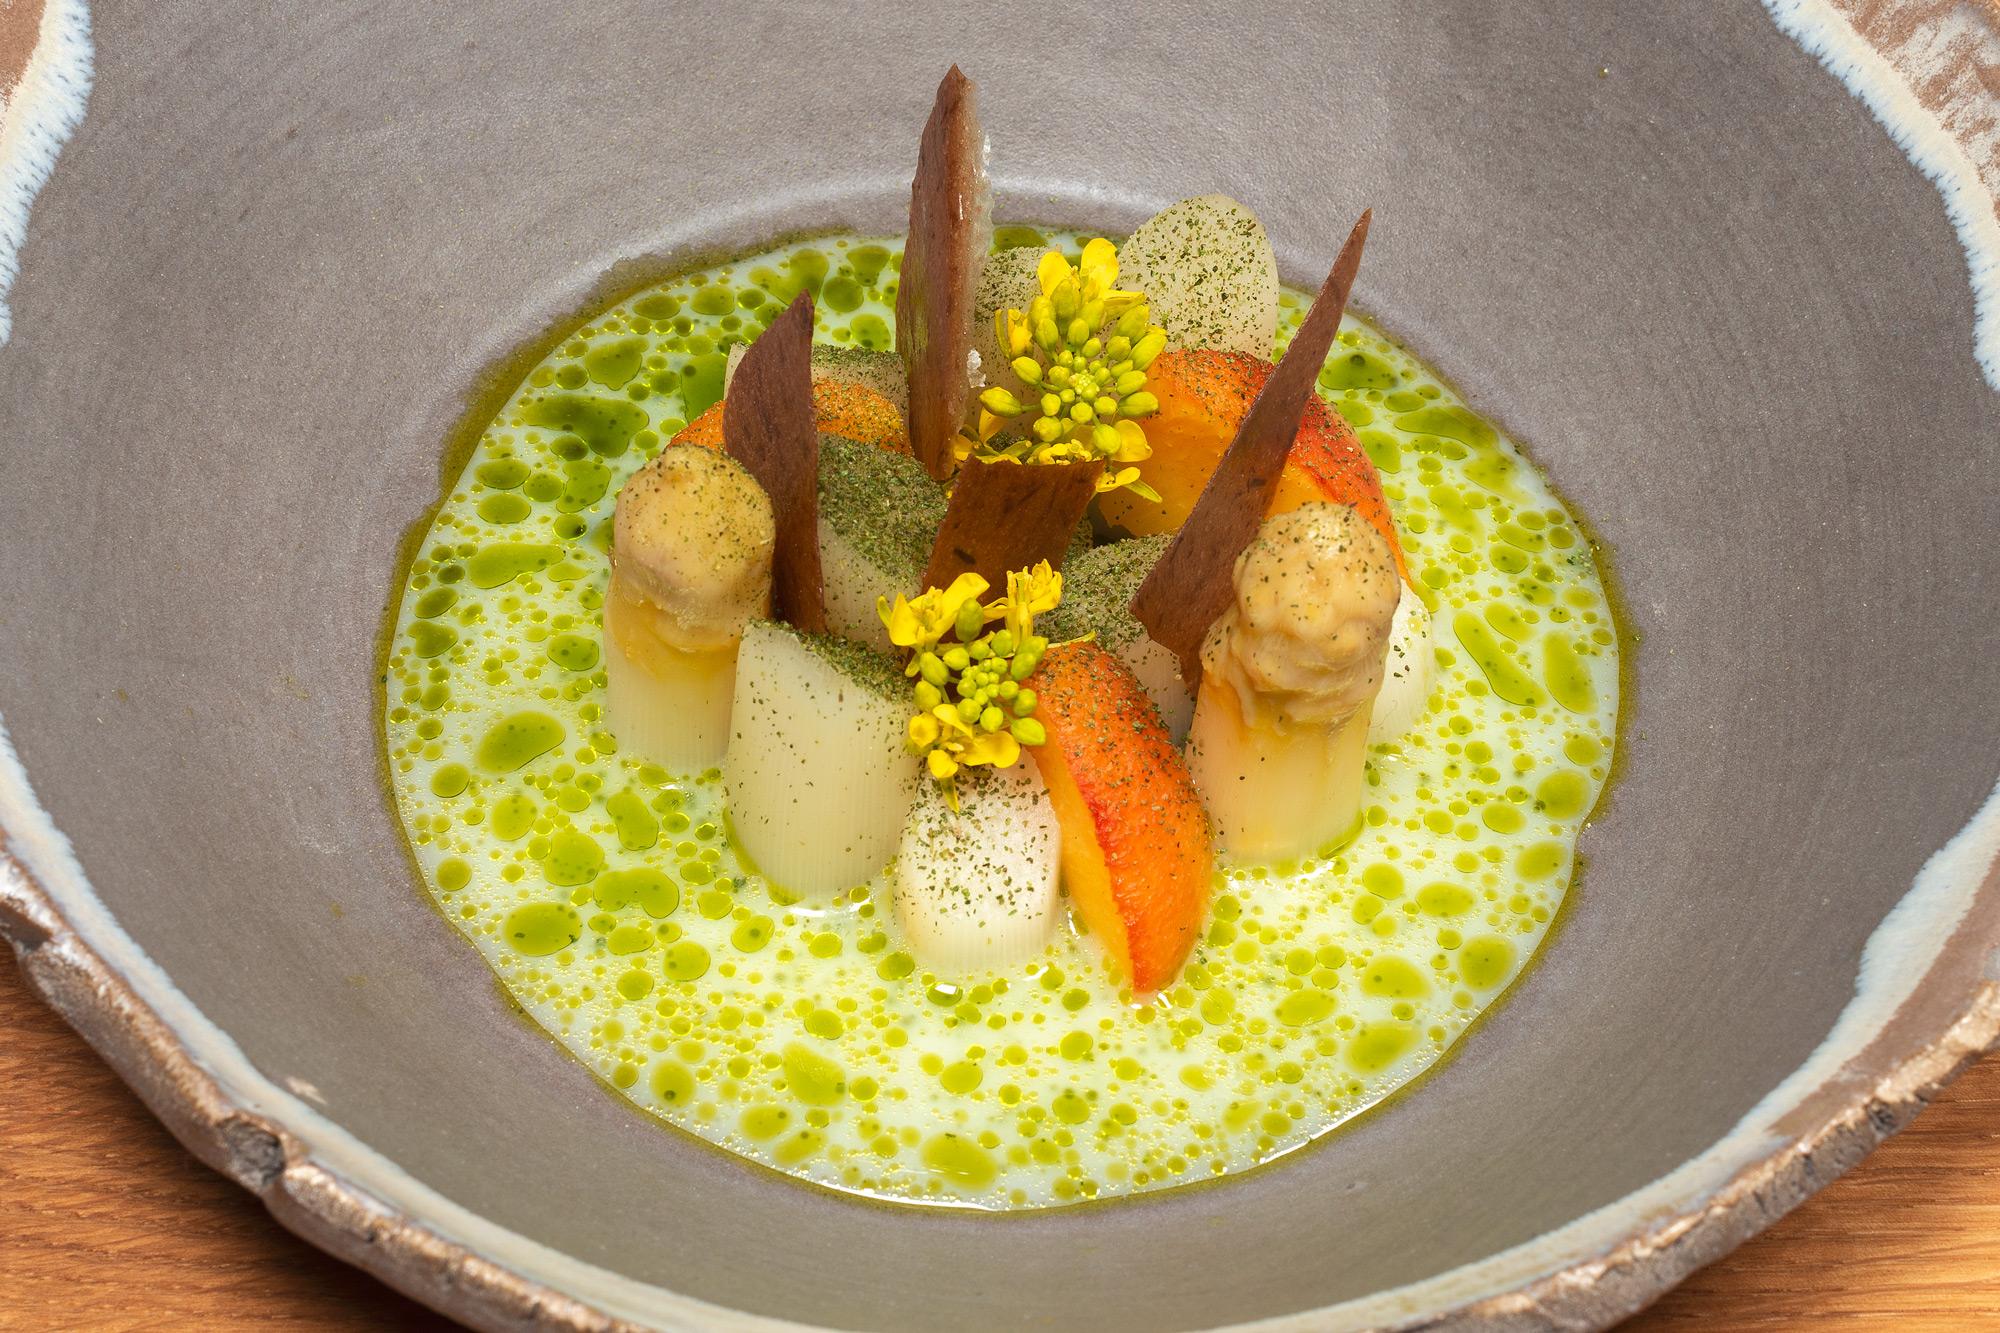 Spargel | Pfirsich | Olive | Estragon